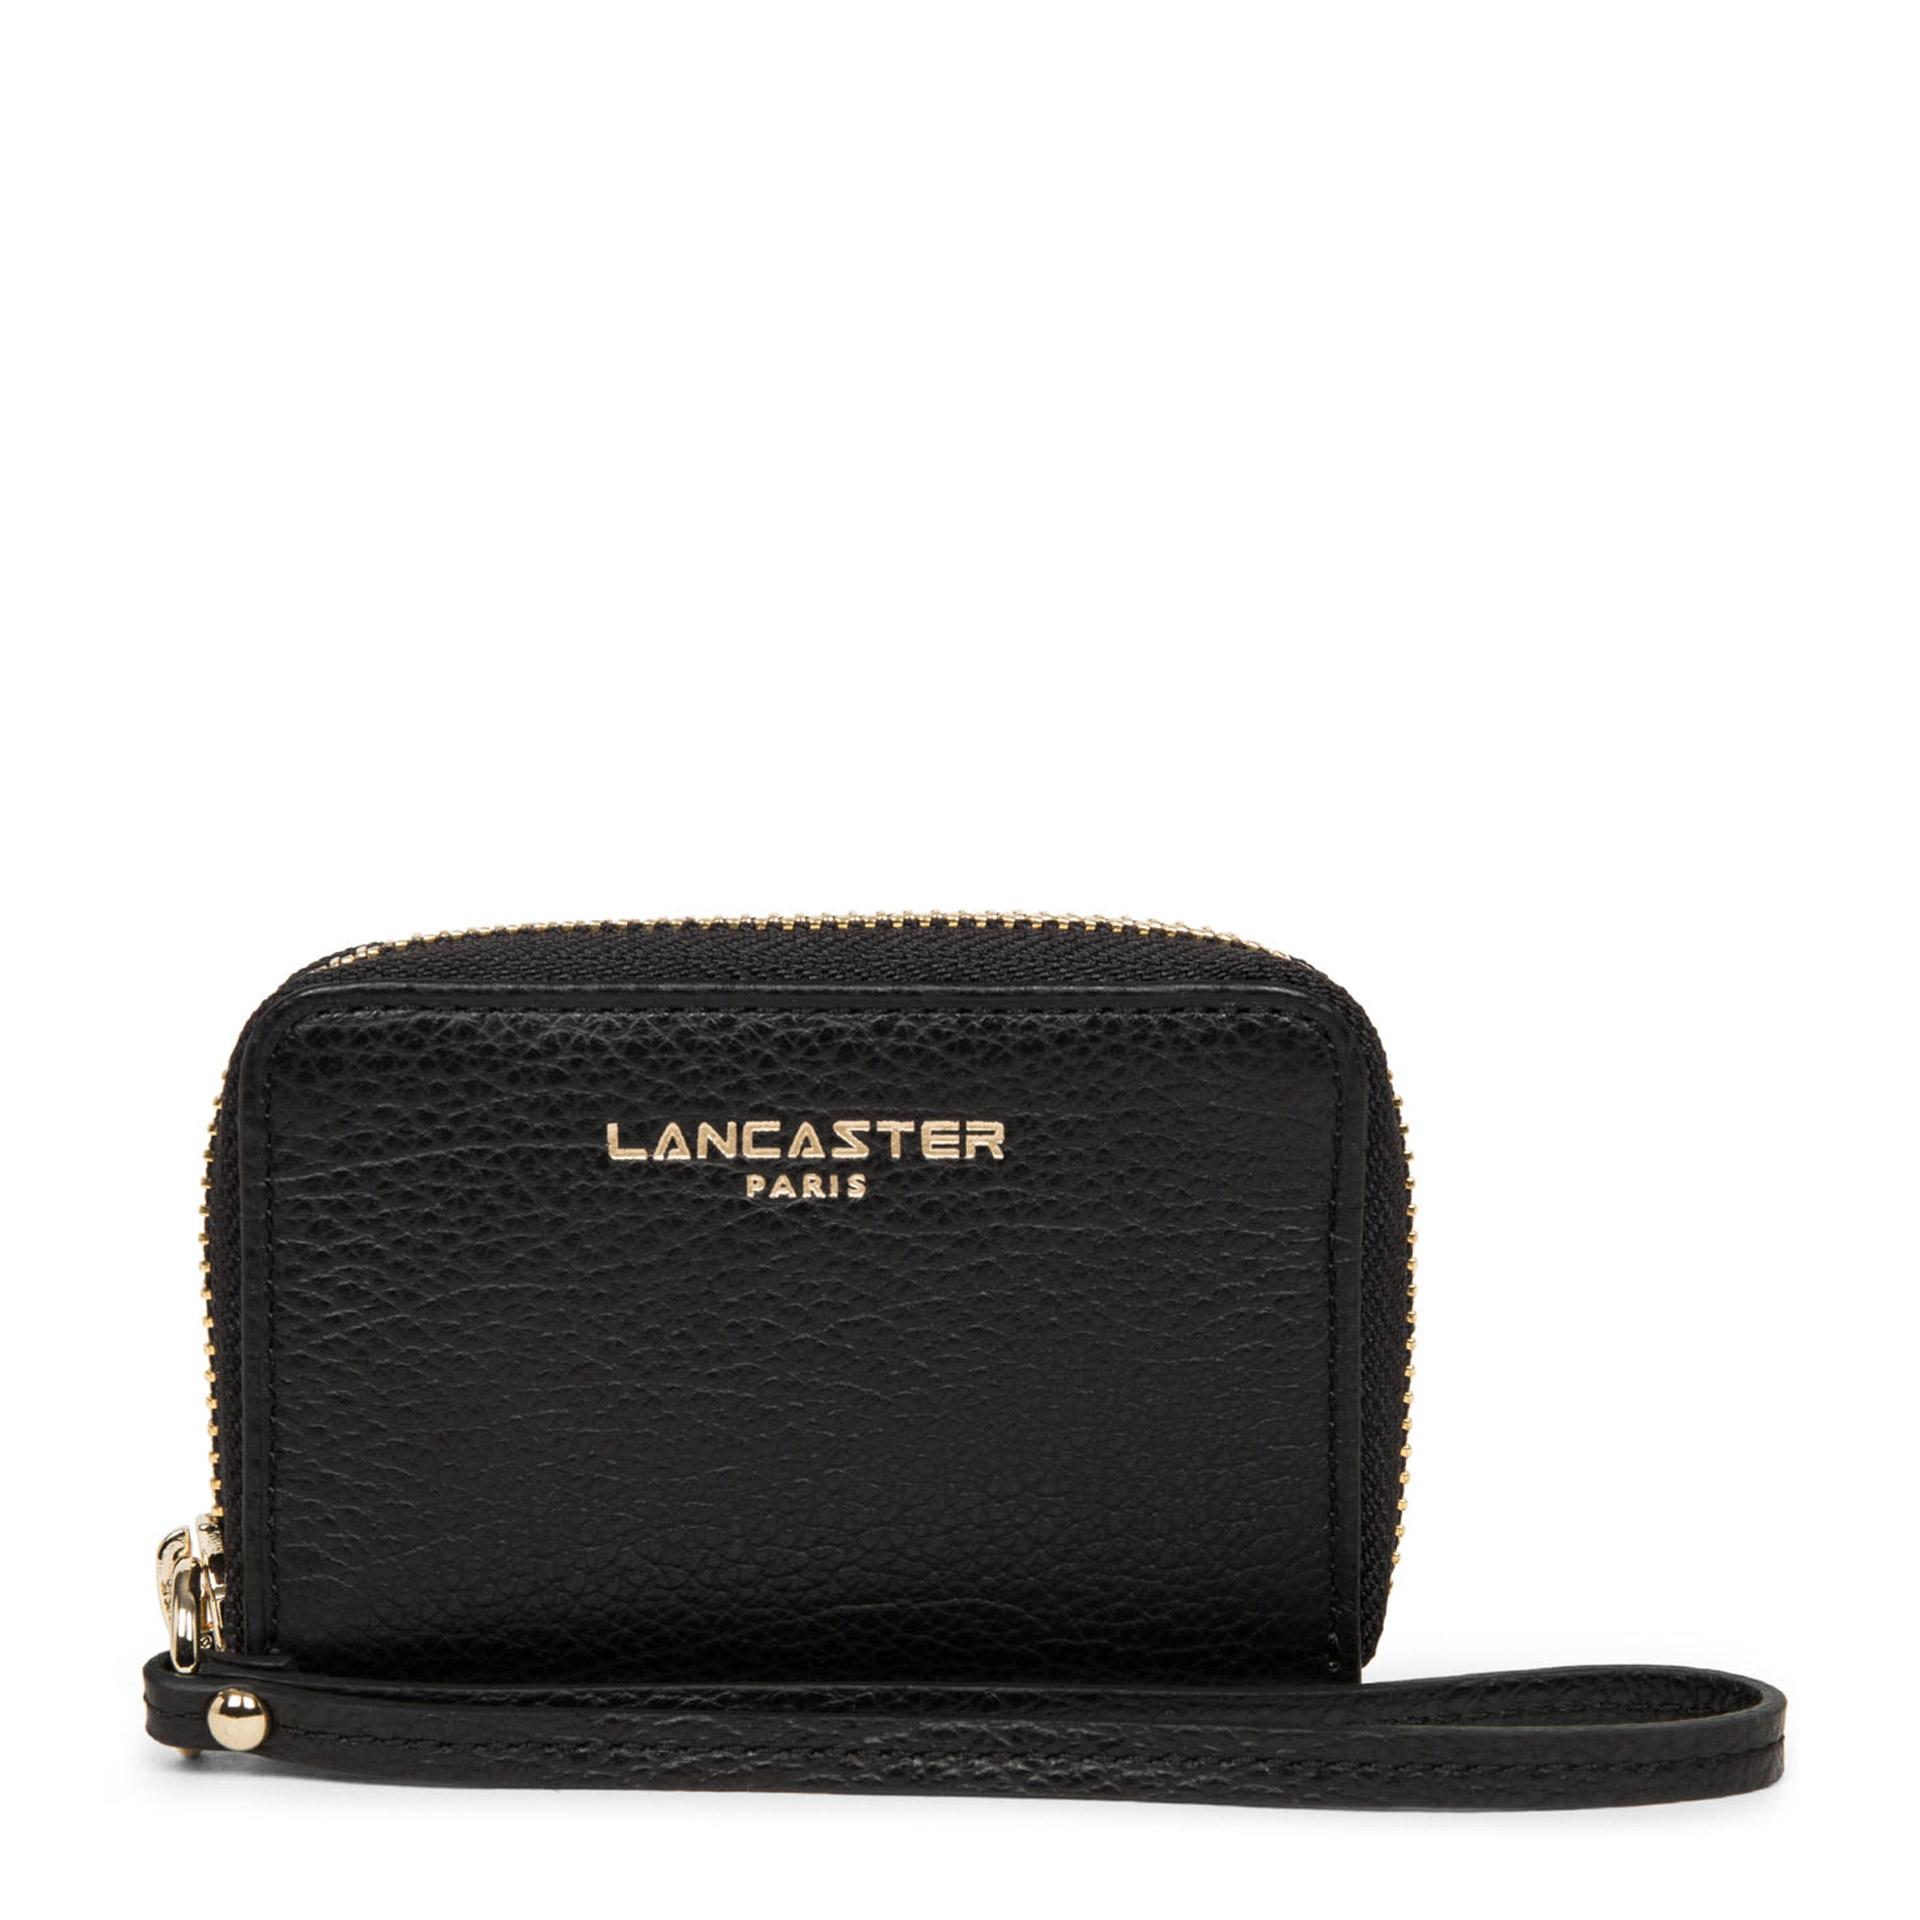 Lancaster Paris Dune Damen Geldbörse noir